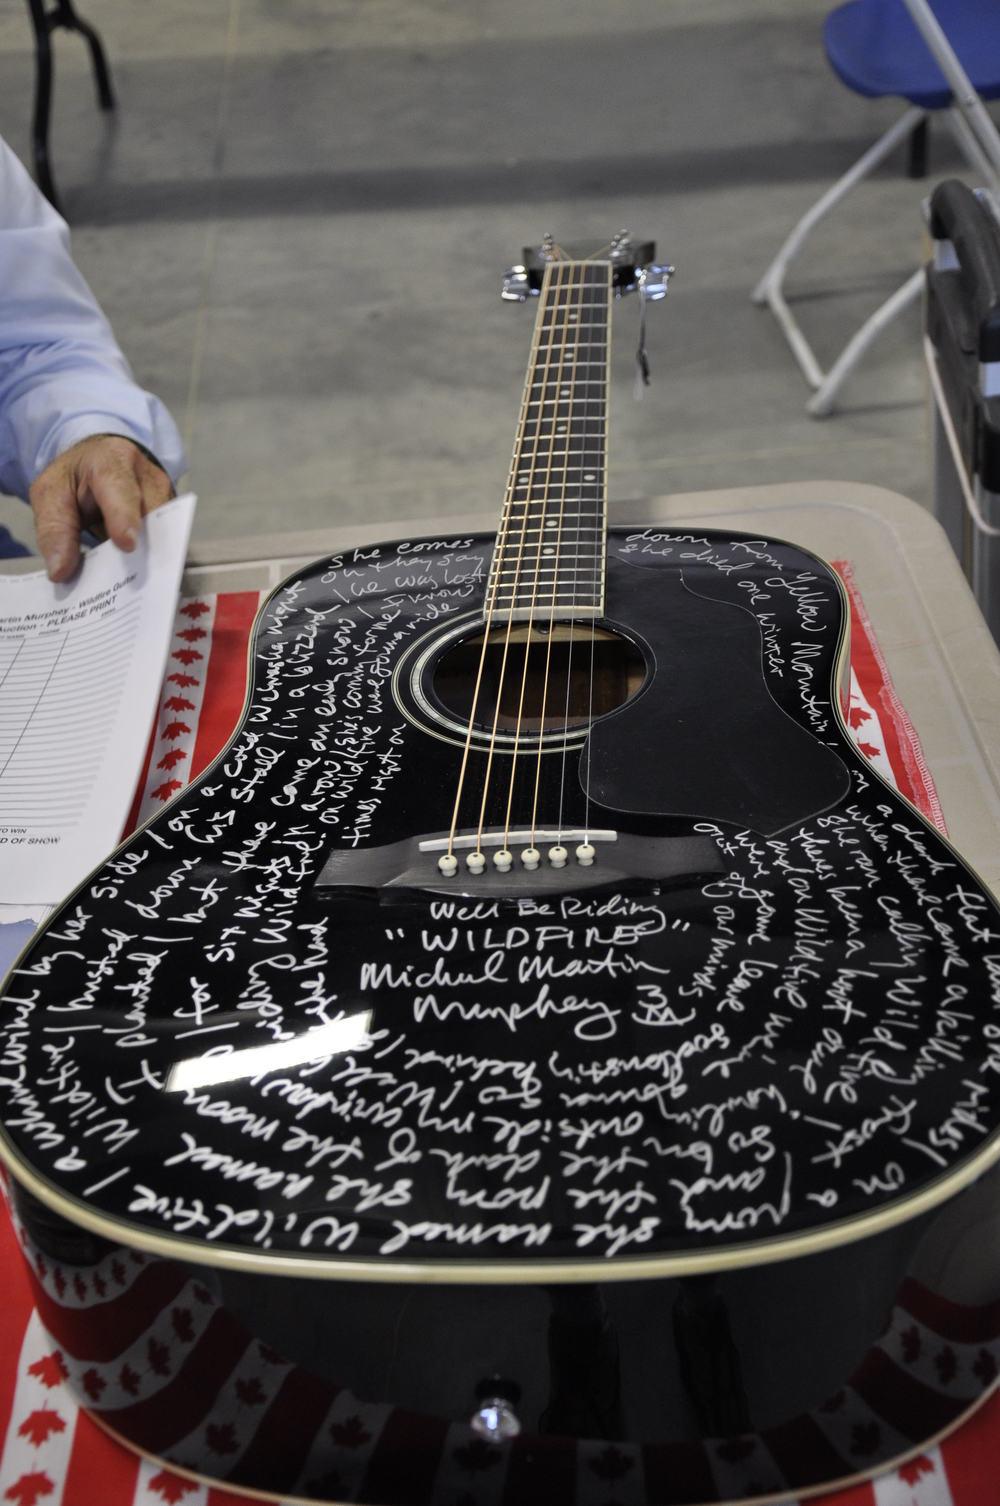 2012 - Silent auction guitar with Michael Martin Murphey's handwritten lyrics to Wildfire